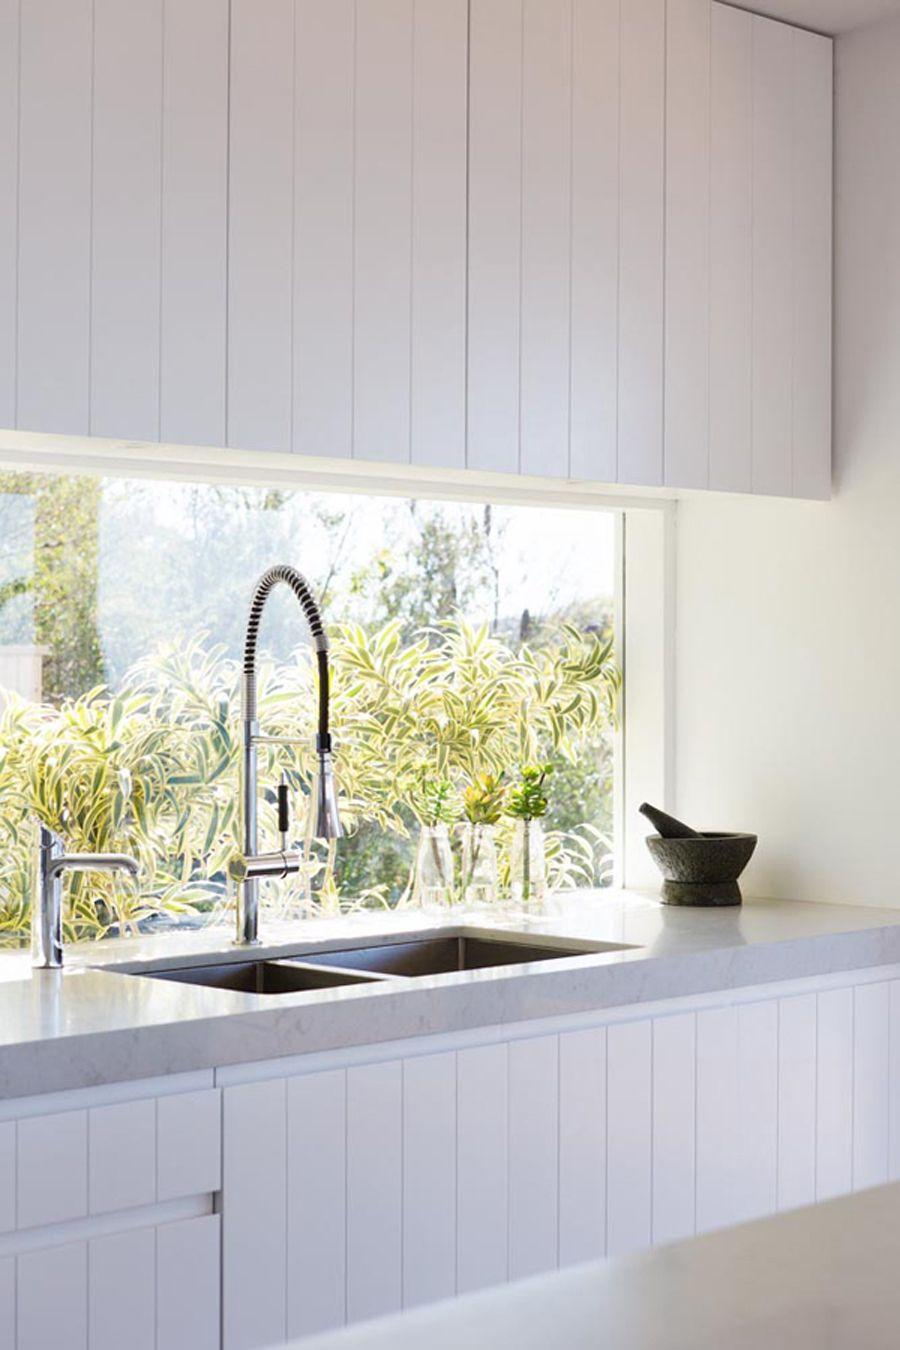 RHa Sunrise House_9.jpg | Home | Pinterest | Kitchens, White ...